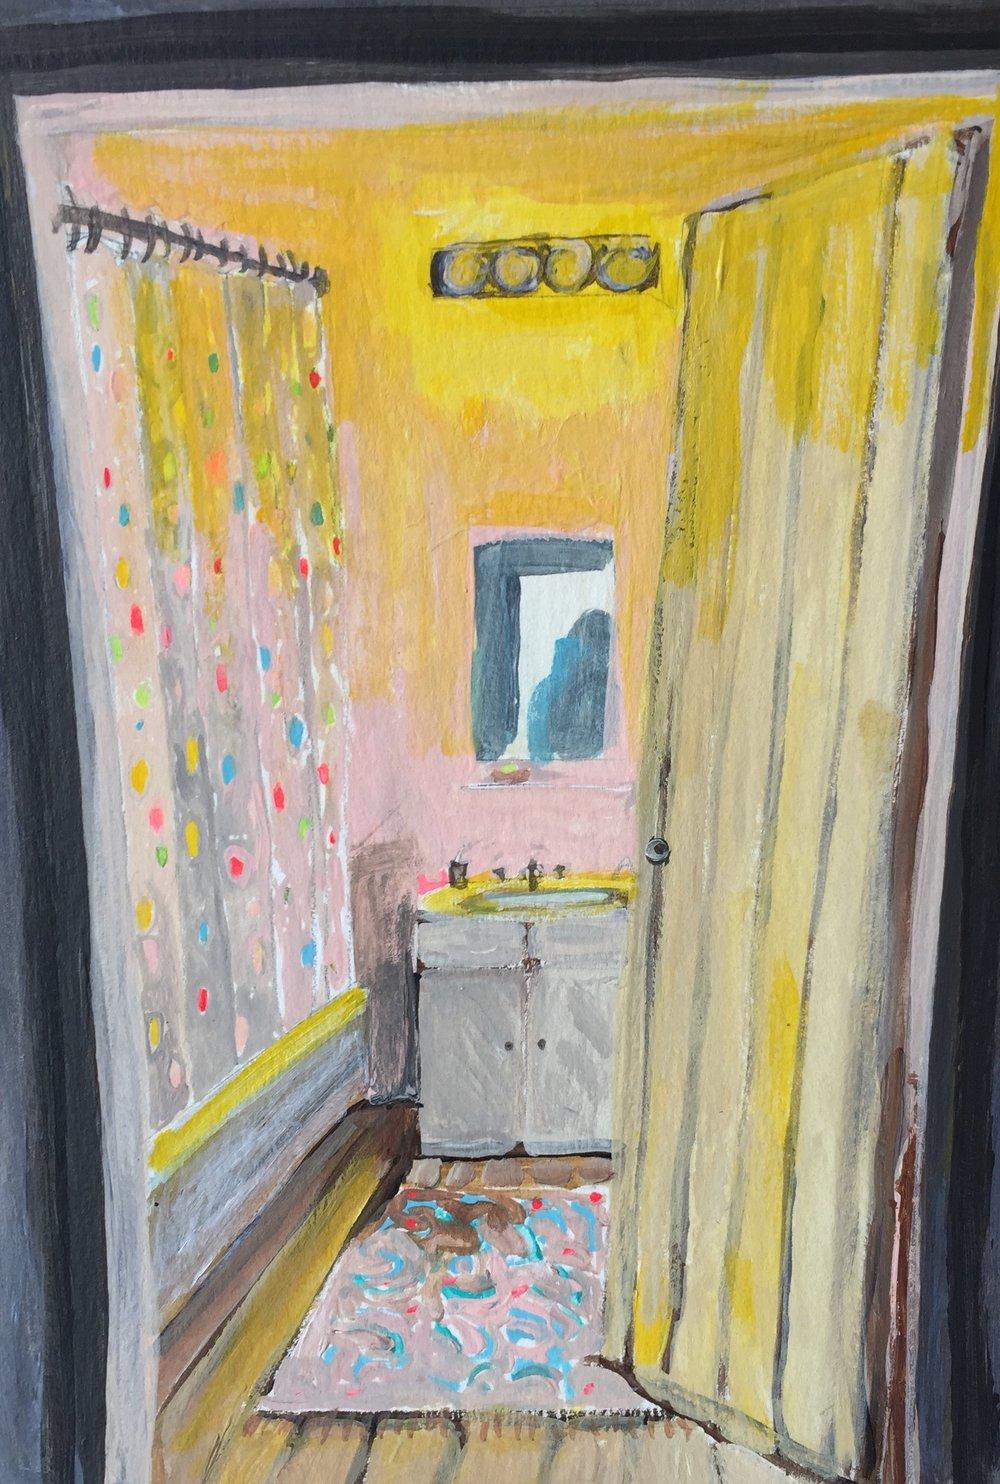 """Polka-Dot Shower Curtain"" by Elizabeth Snelling"